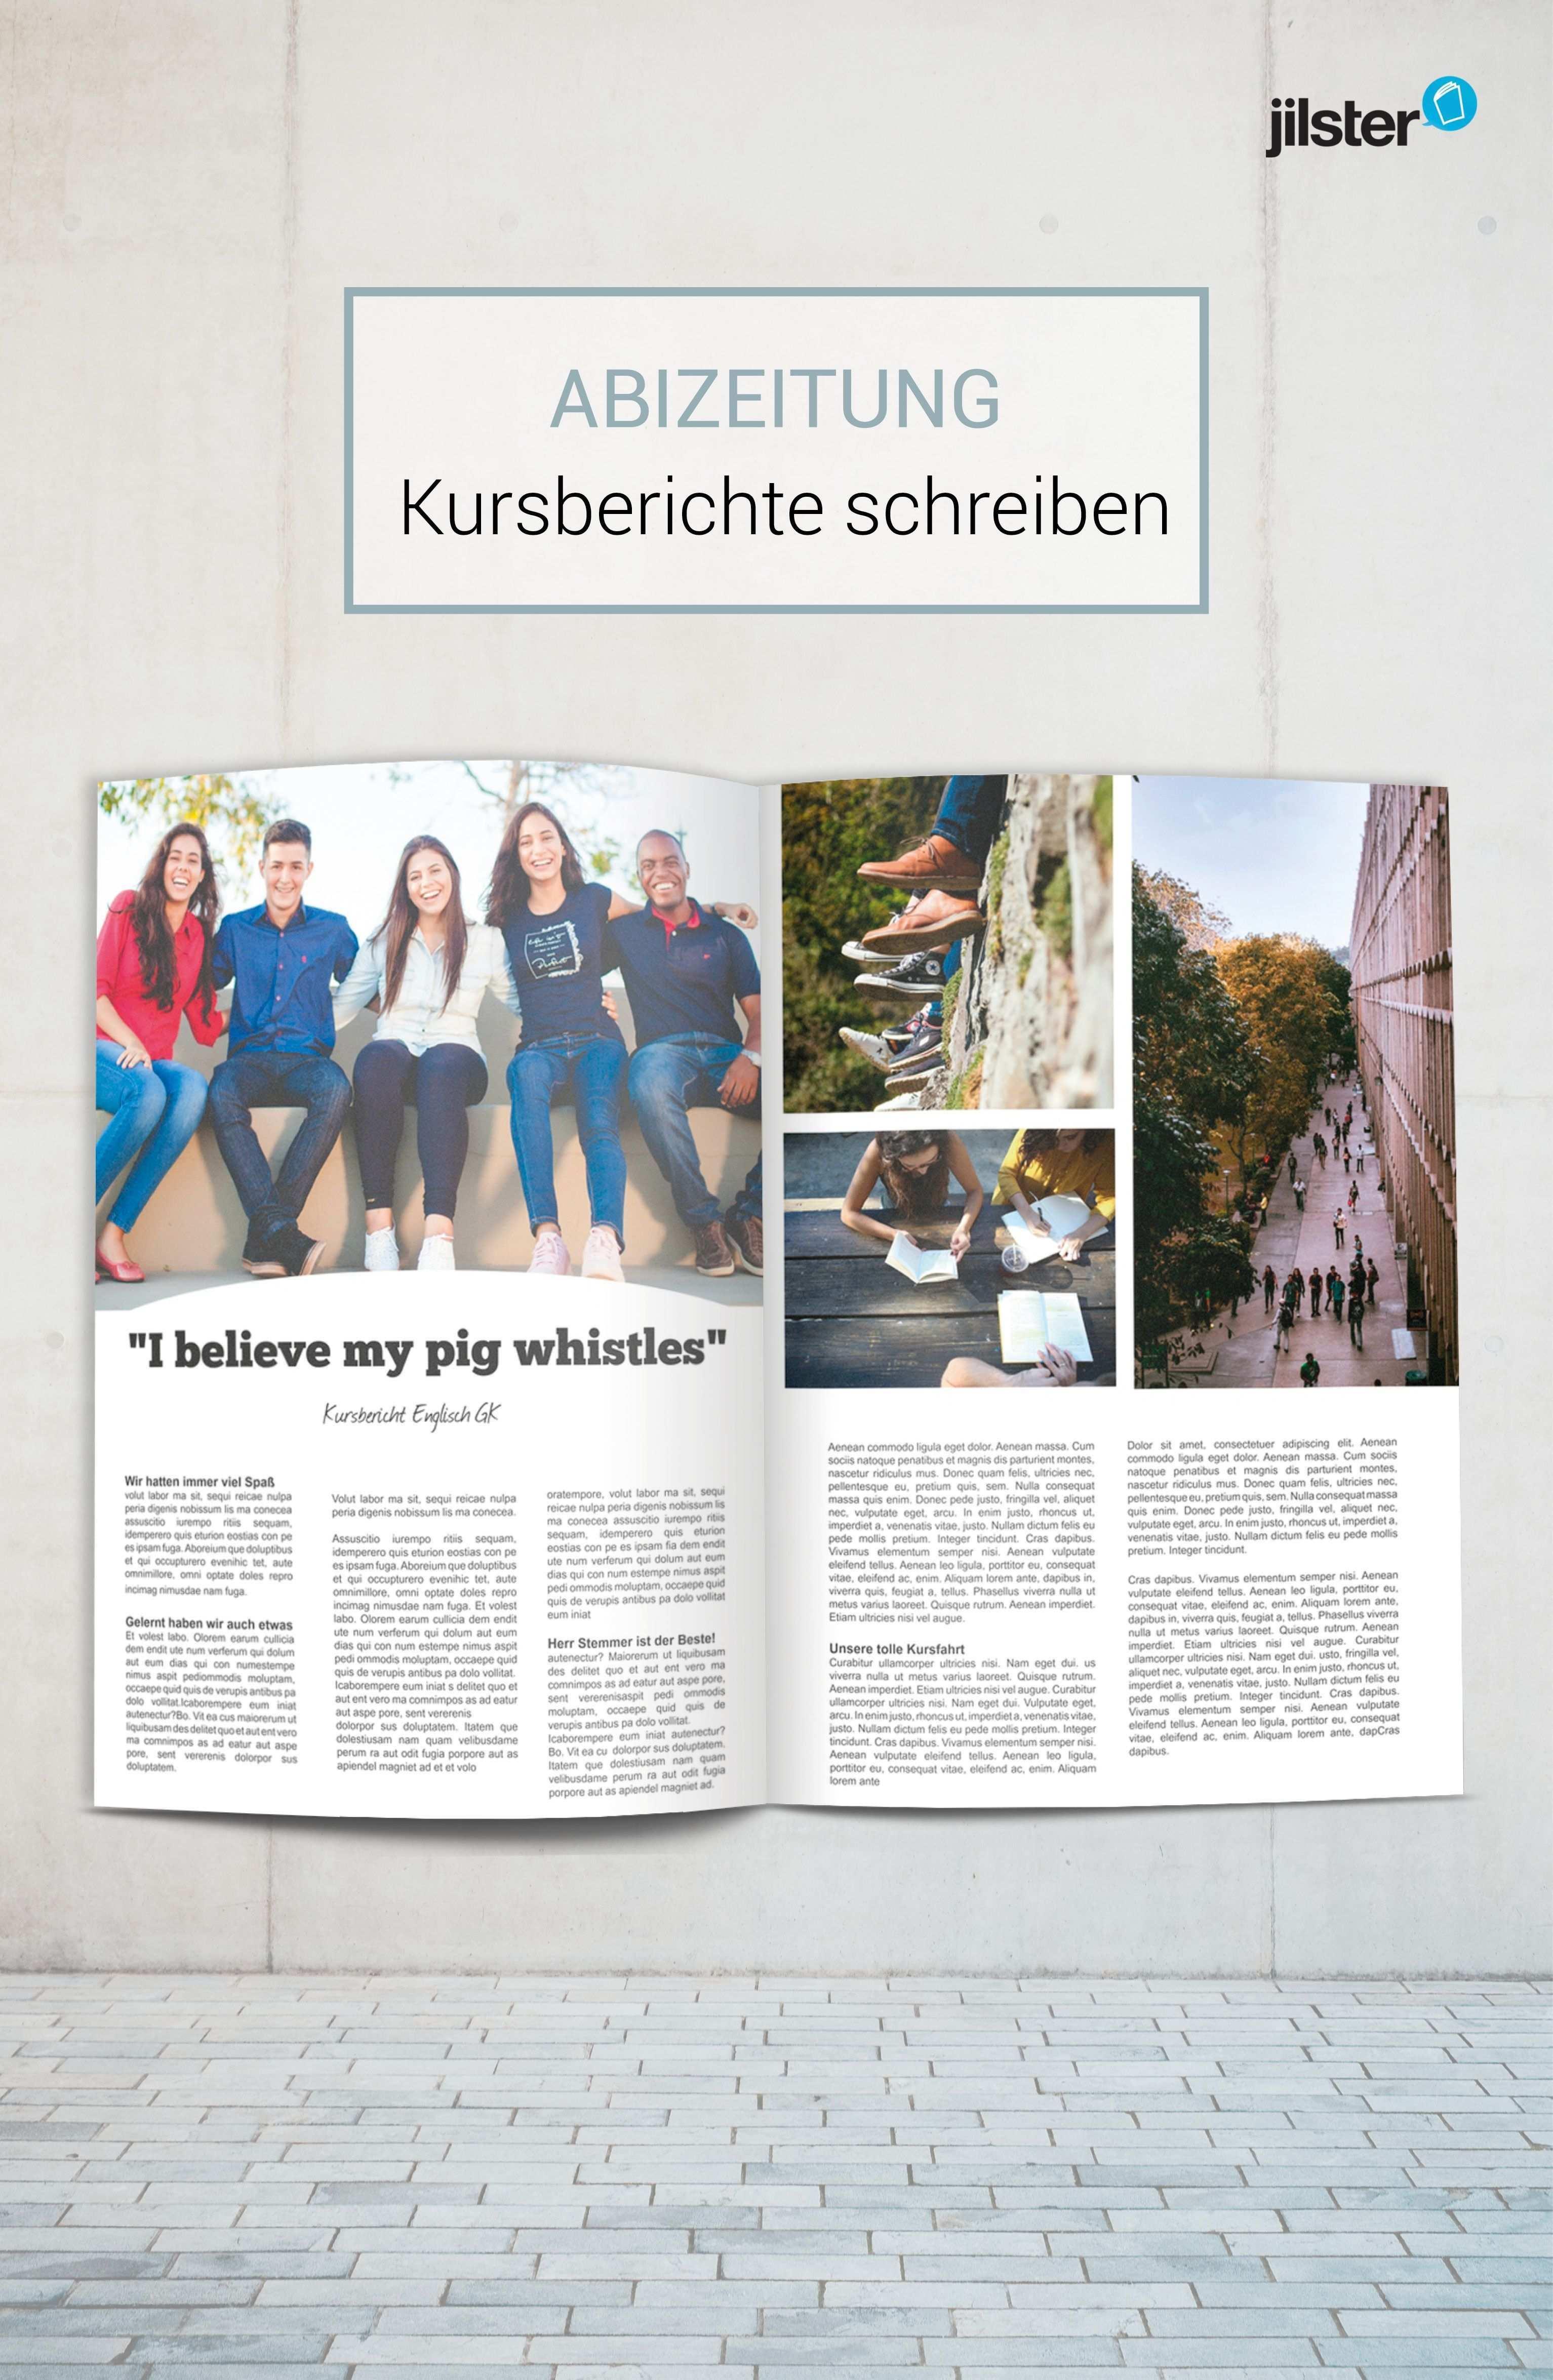 Abizeitung Kursbericht Schreiben Der Alles Ans Licht Bringt Jilster Blog Abizeitung Zeitung Schulerzeitung